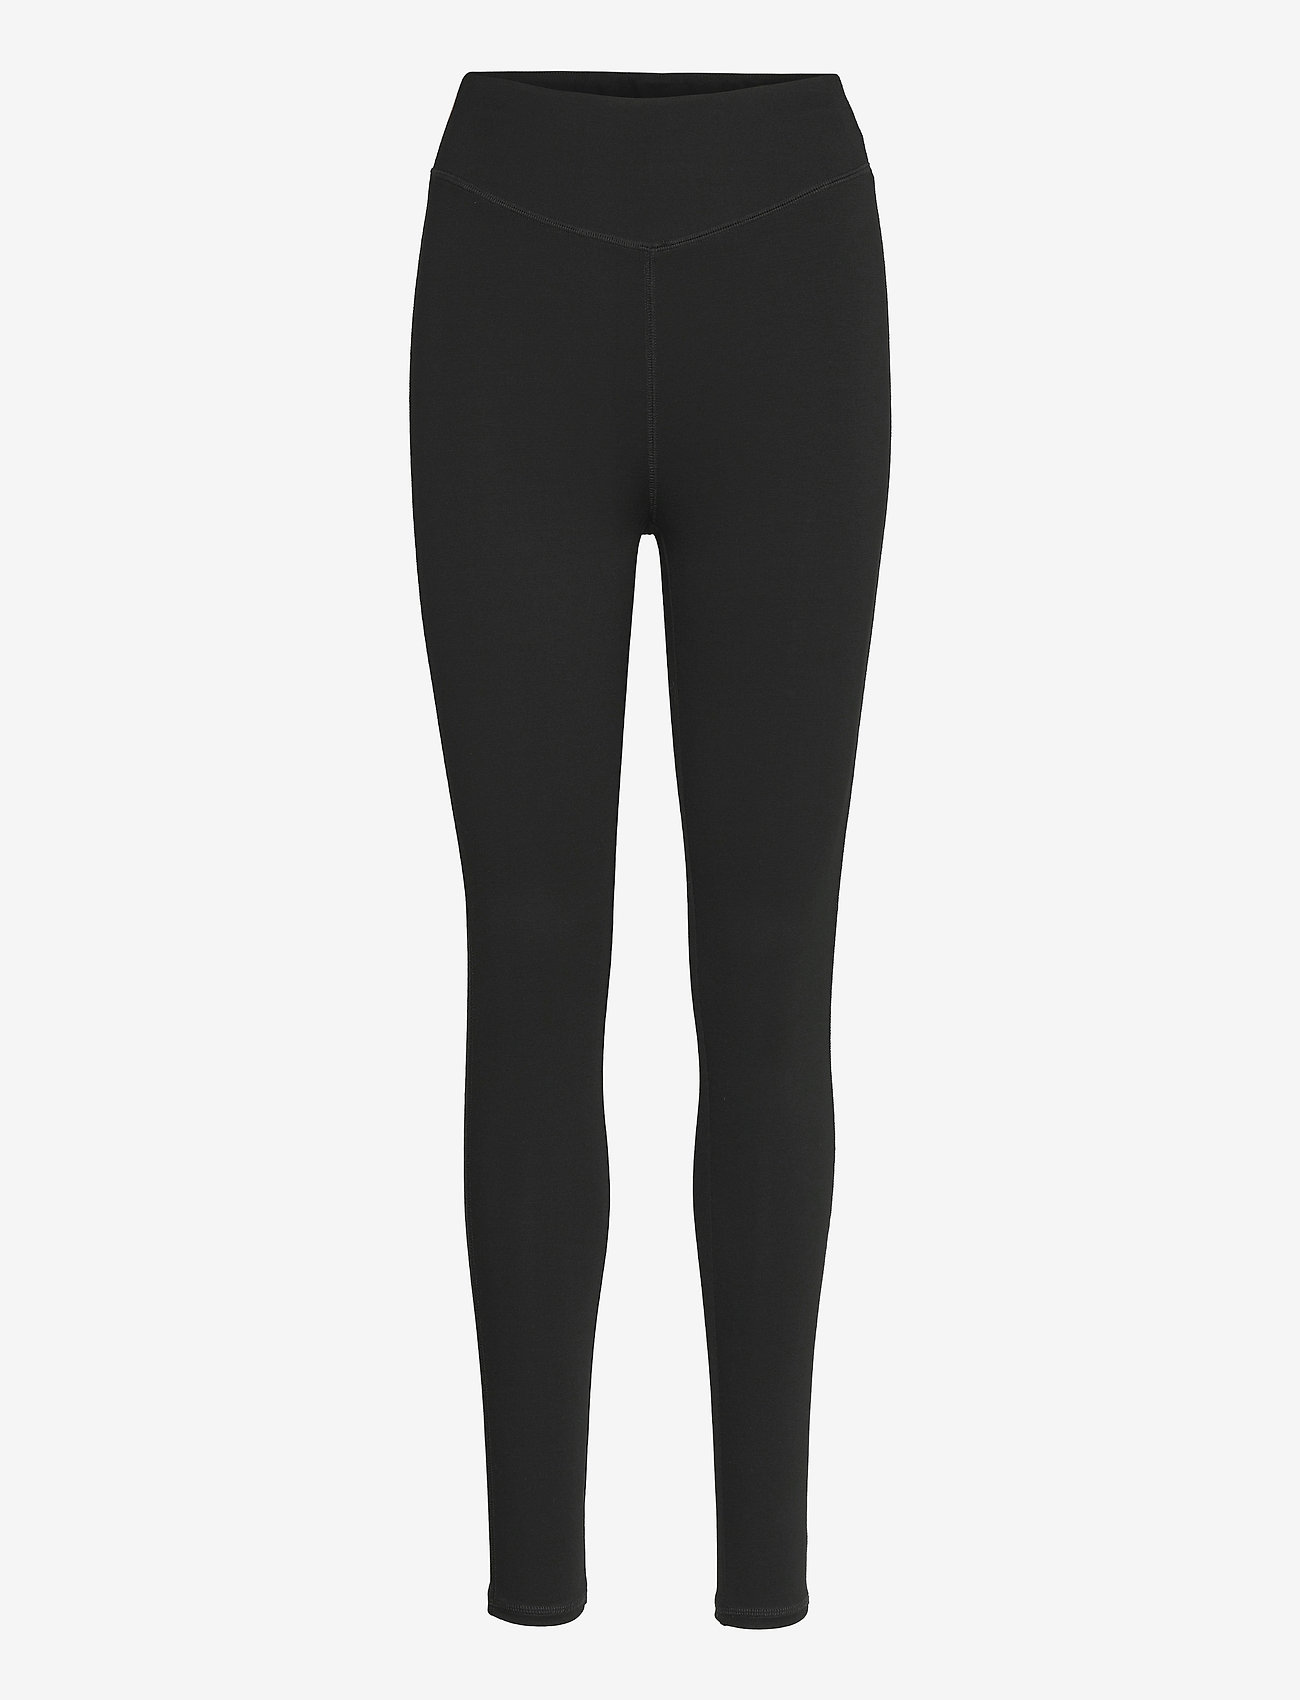 Twist & Tango - Ava Tights - leggings - black - 0